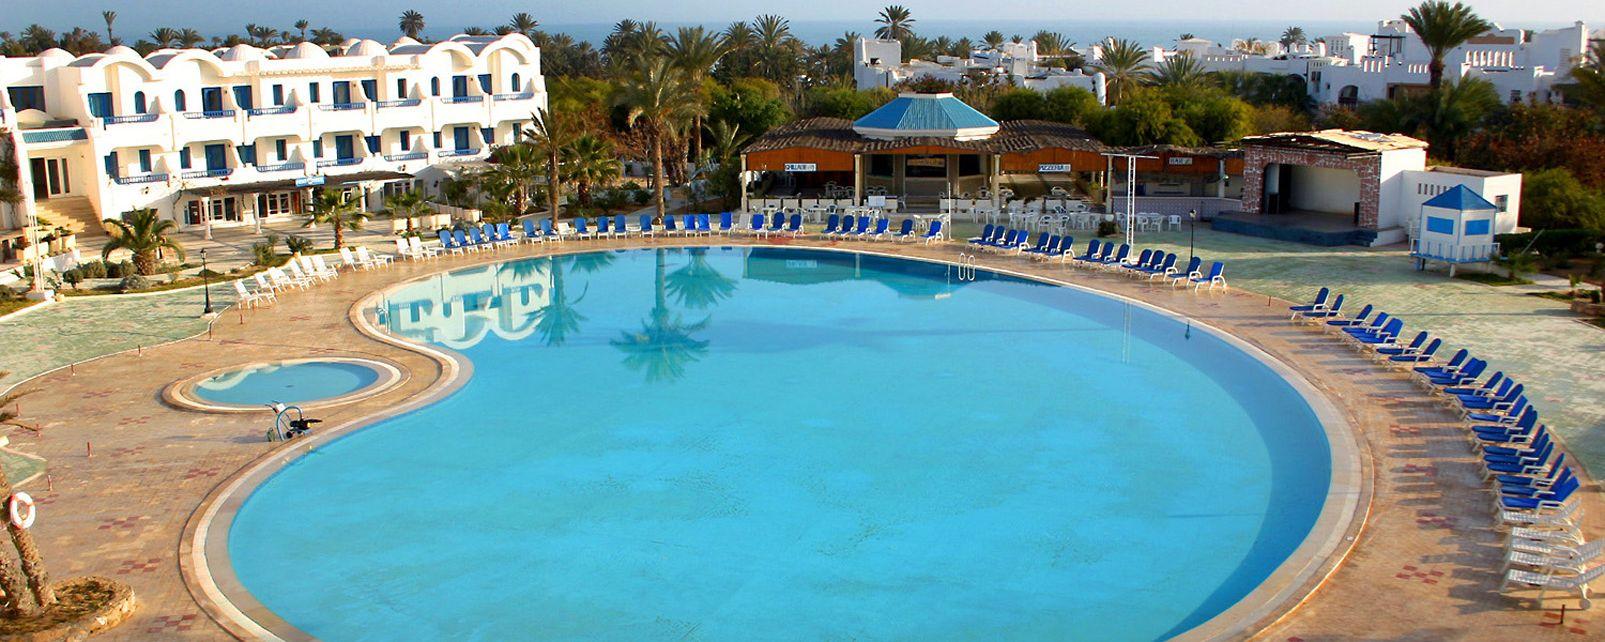 Hotel giktis in zarzis tunisia for Hotels zarzis